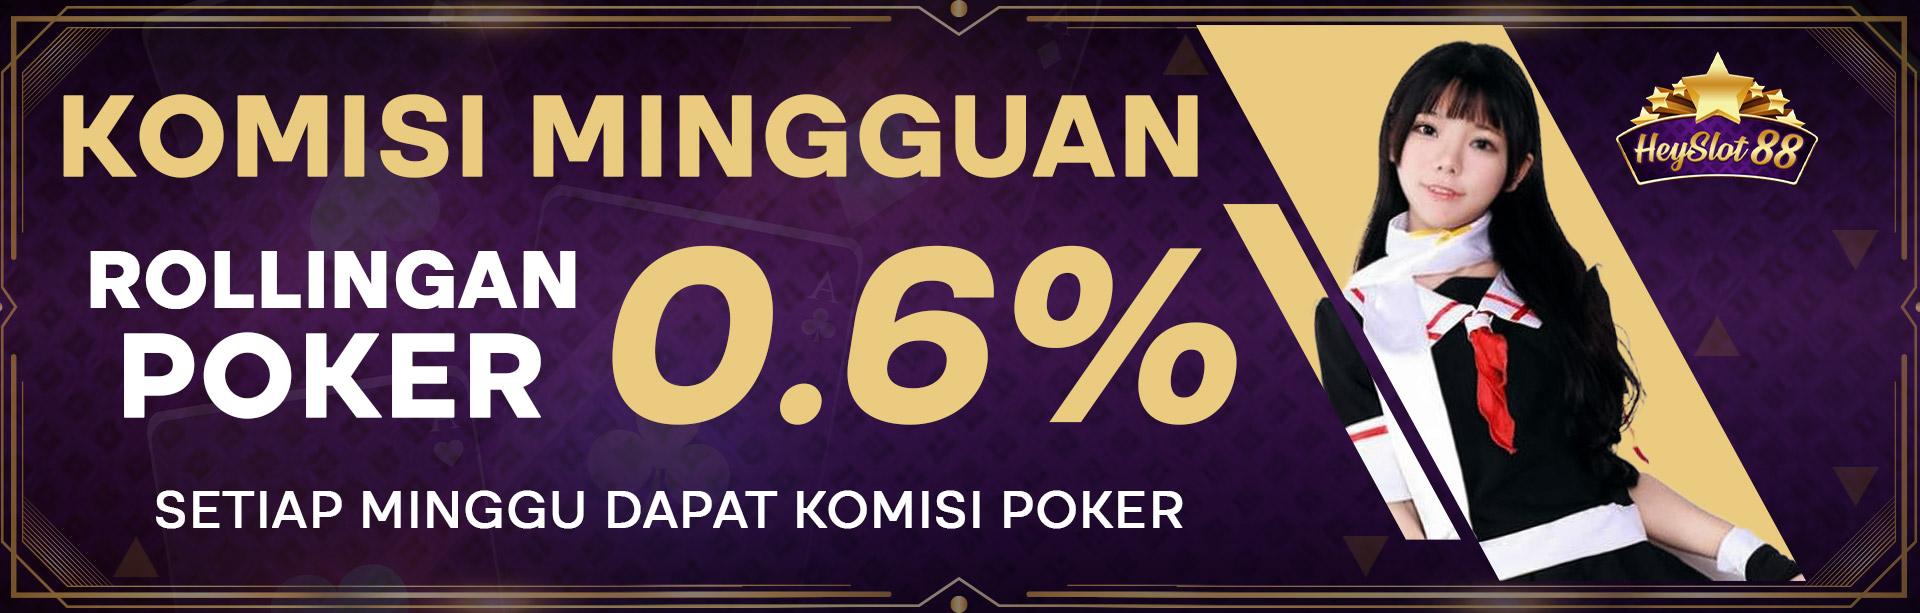 Bonus Komisi Mingguan Poker 0.6%